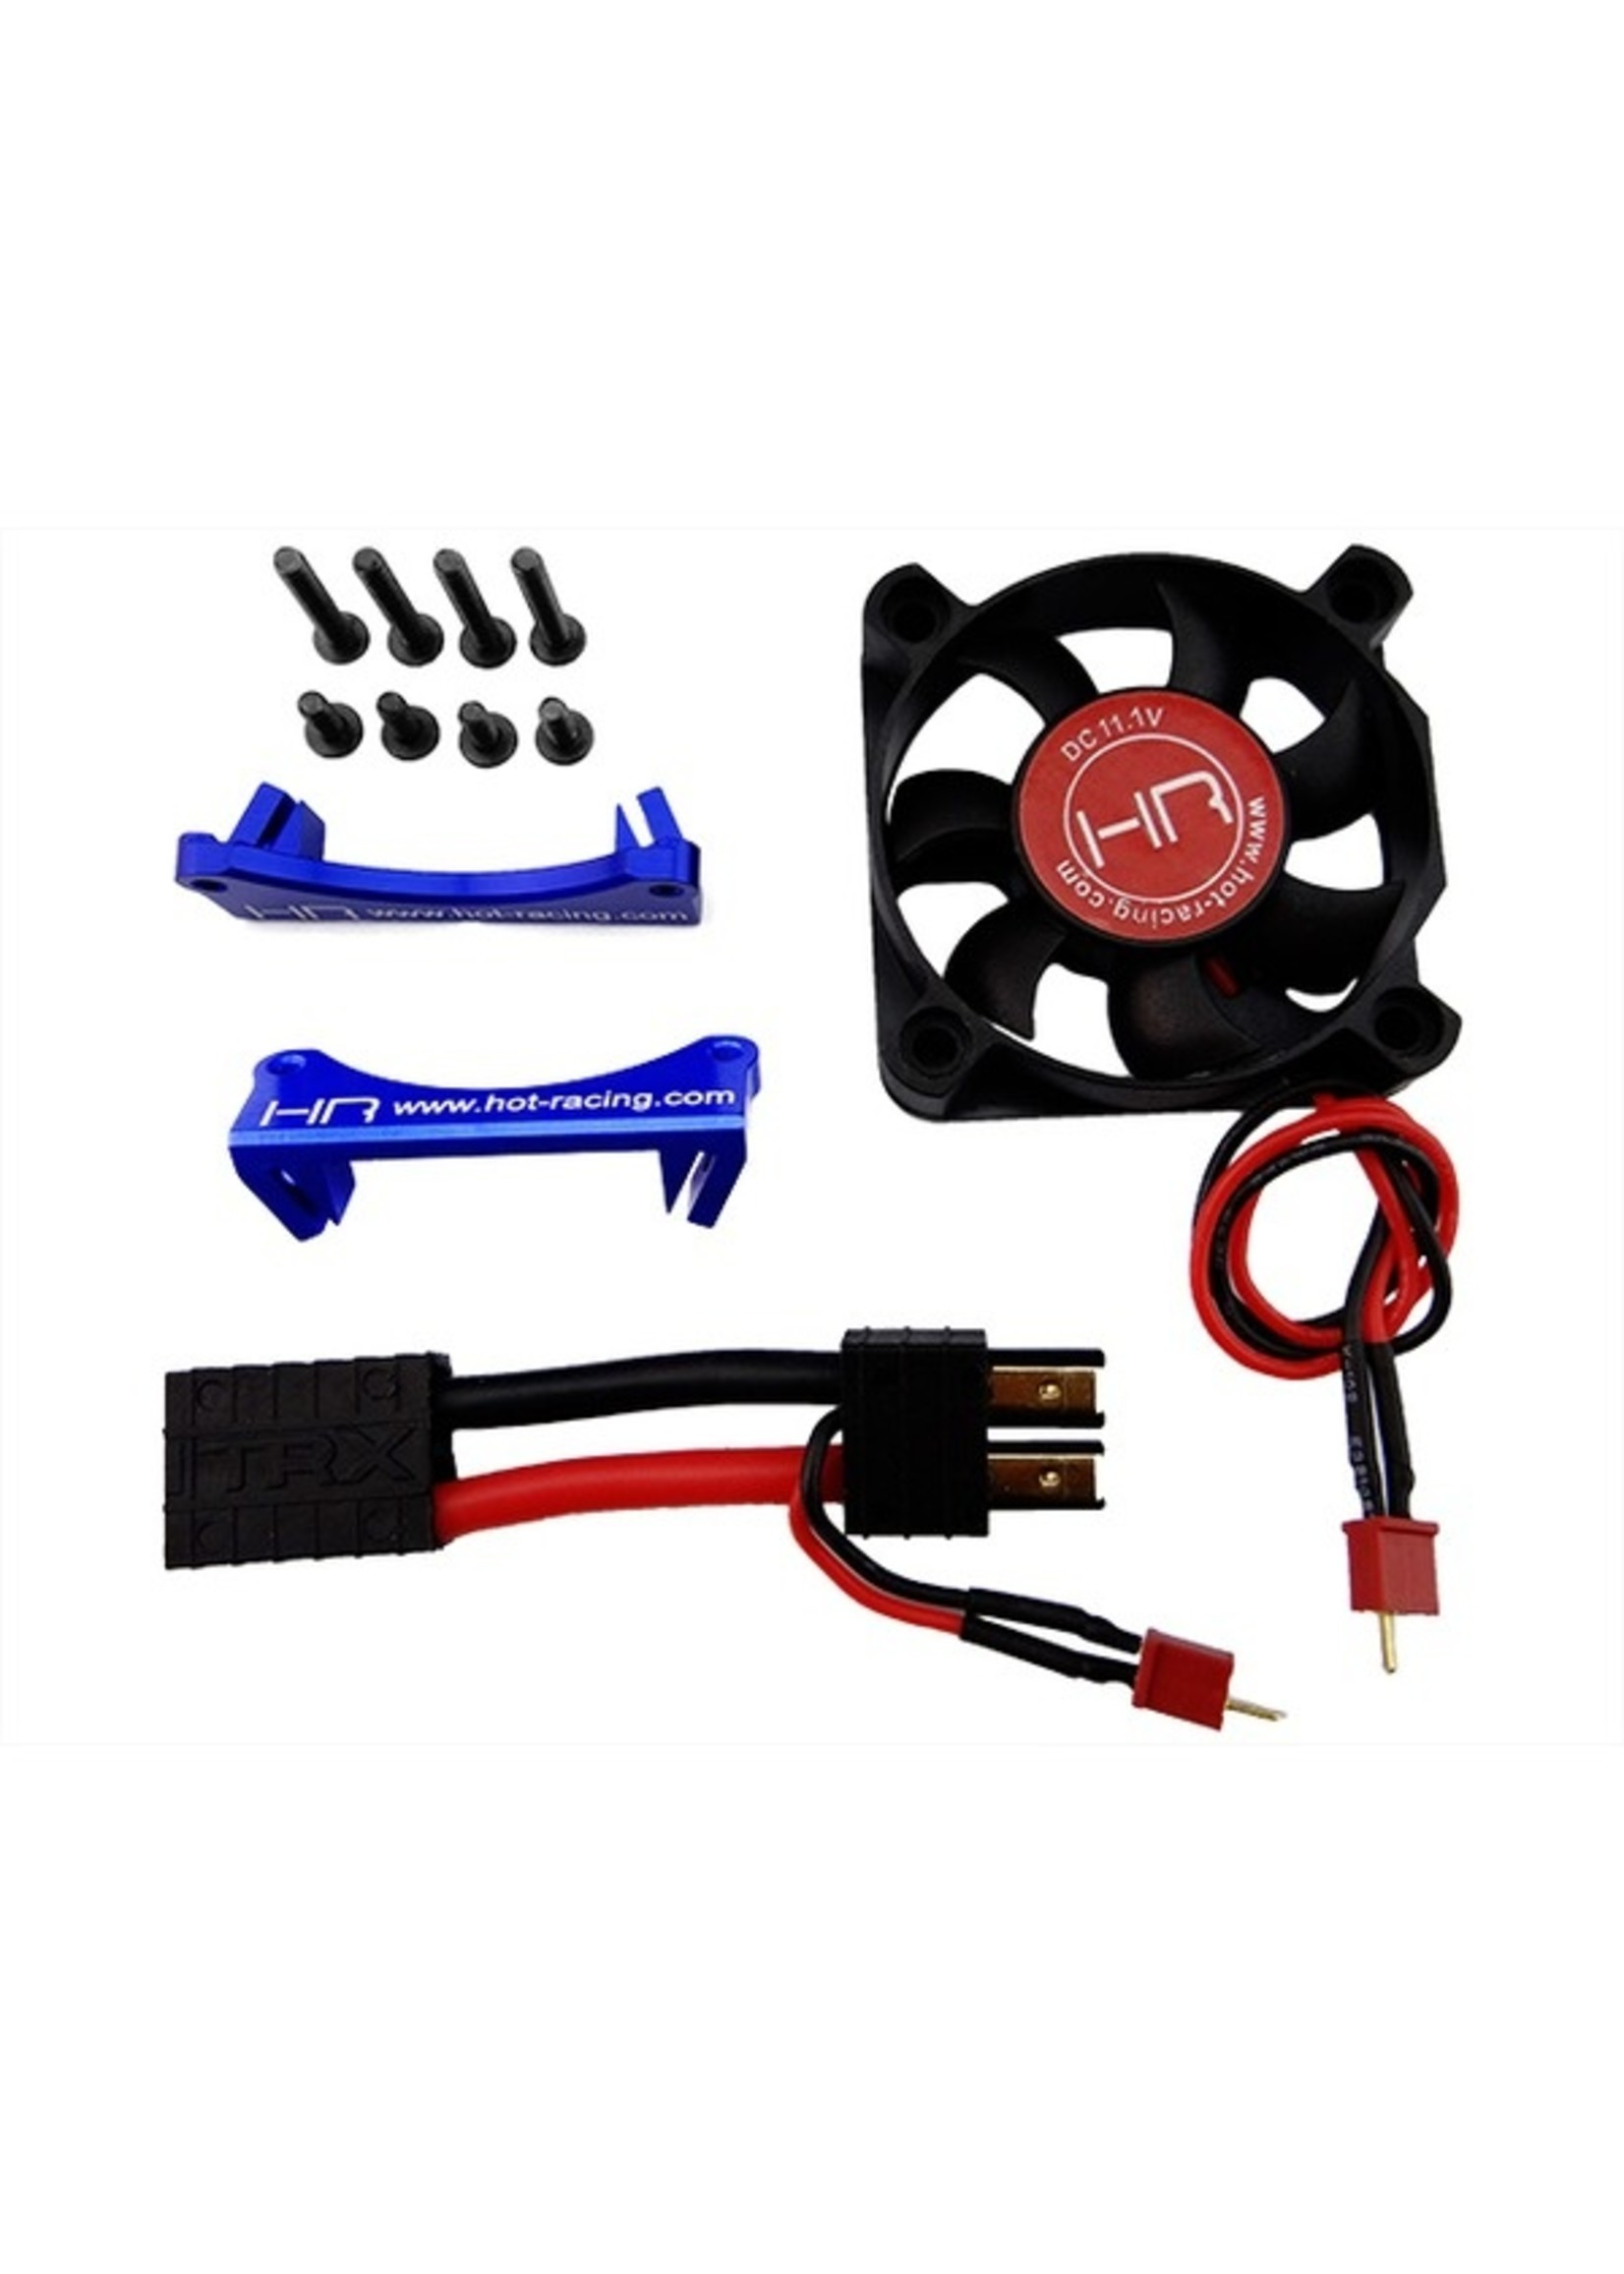 Hot Racing HRAAON505F06 Hot Racing Arrma 1/8 3 Cell Monster Blower Motor Cooling Fan Kit